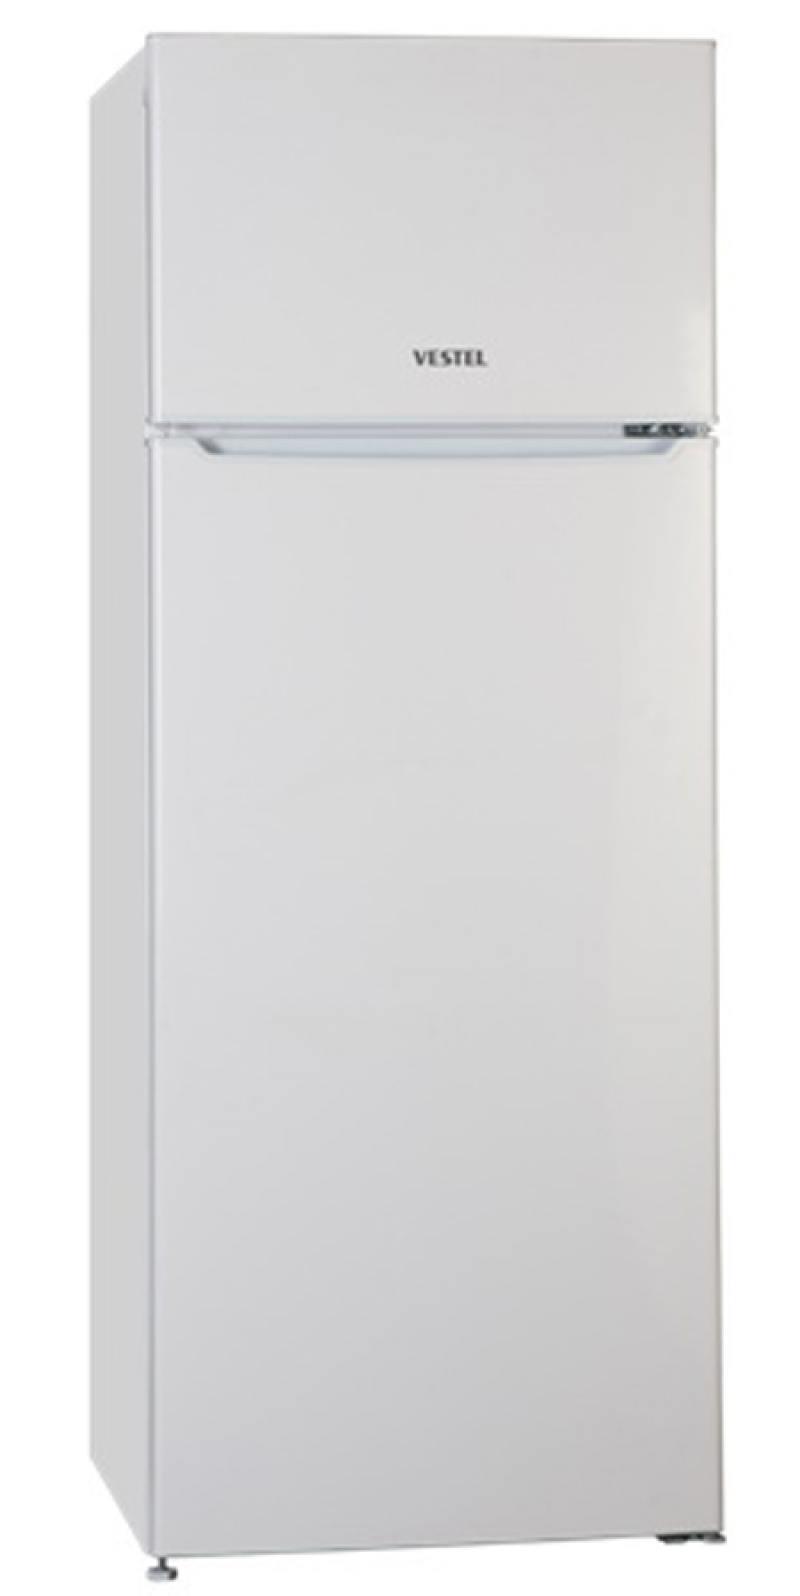 Холодильник Vestel VDD 260 VW vestel vdg 30 s2